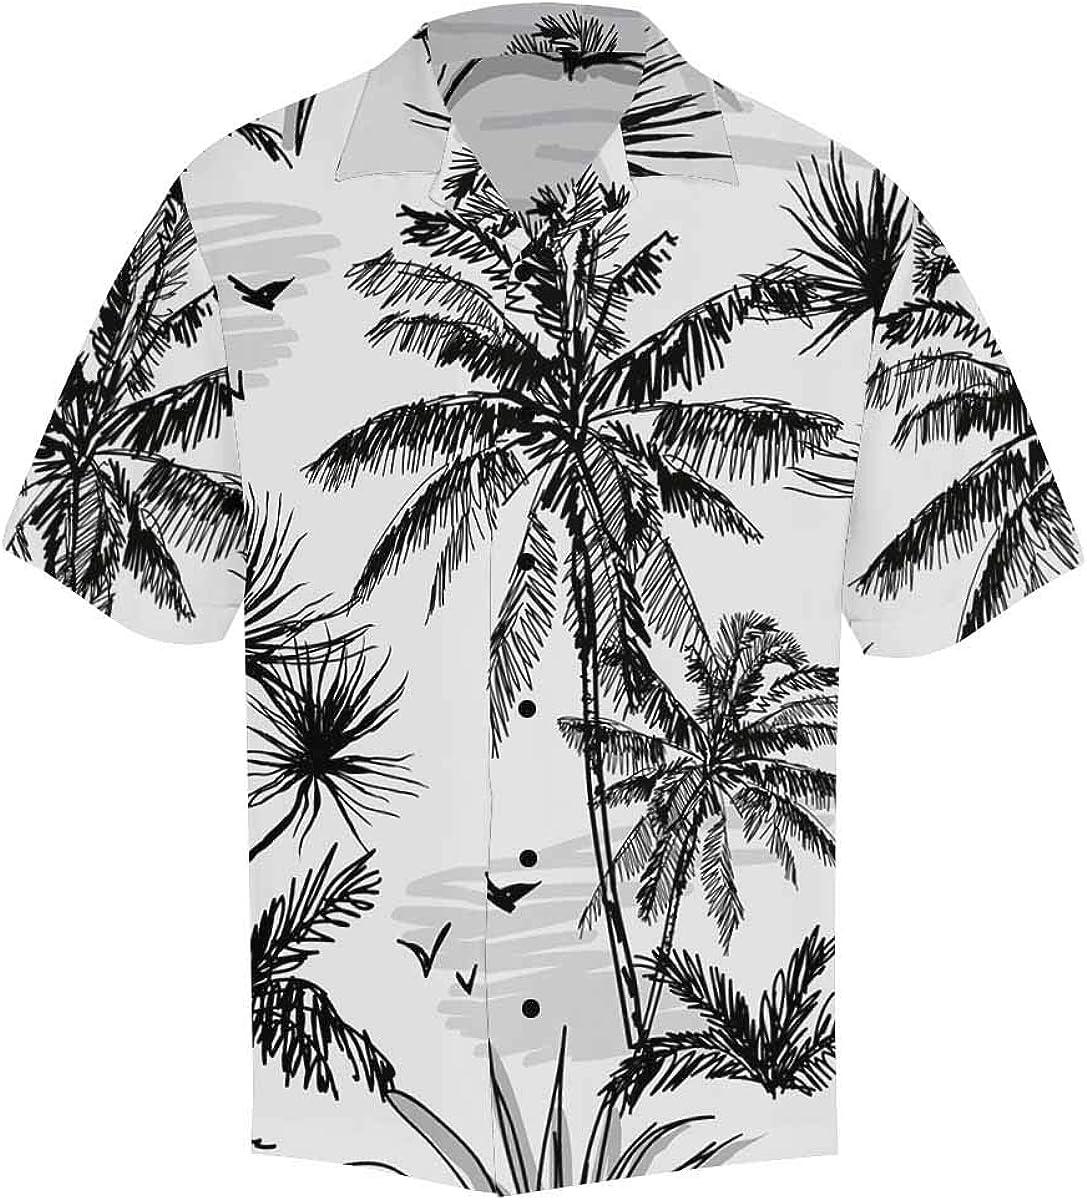 InterestPrint Men's Casual Button Down Short Sleeve Rainbow Hearts Hawaiian Shirt (S-5XL)